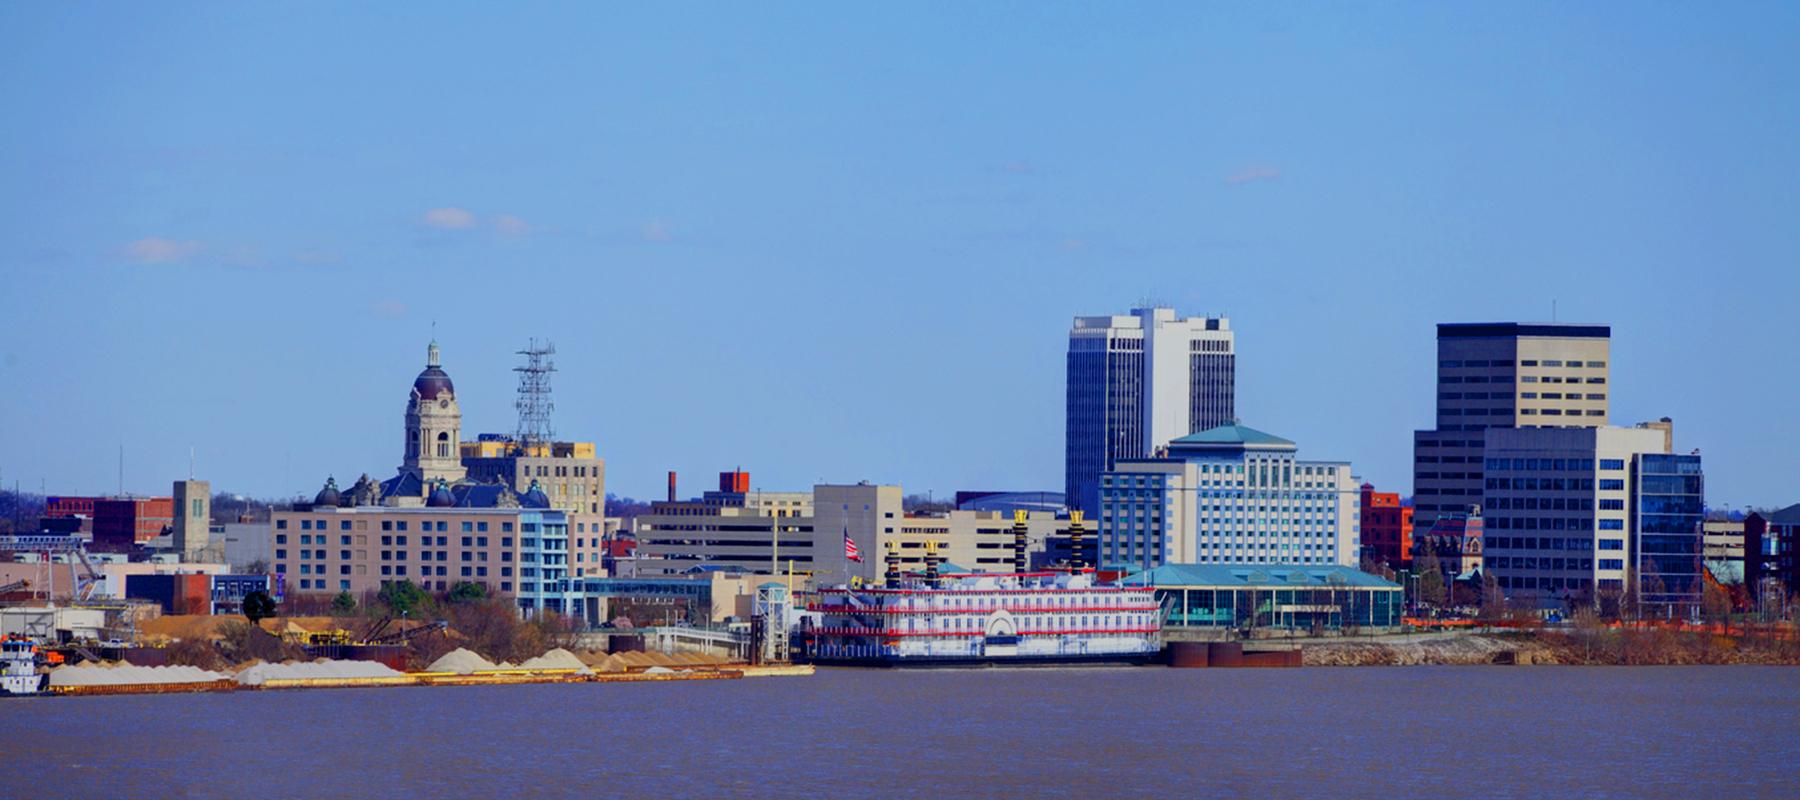 Image of Evansville, IN